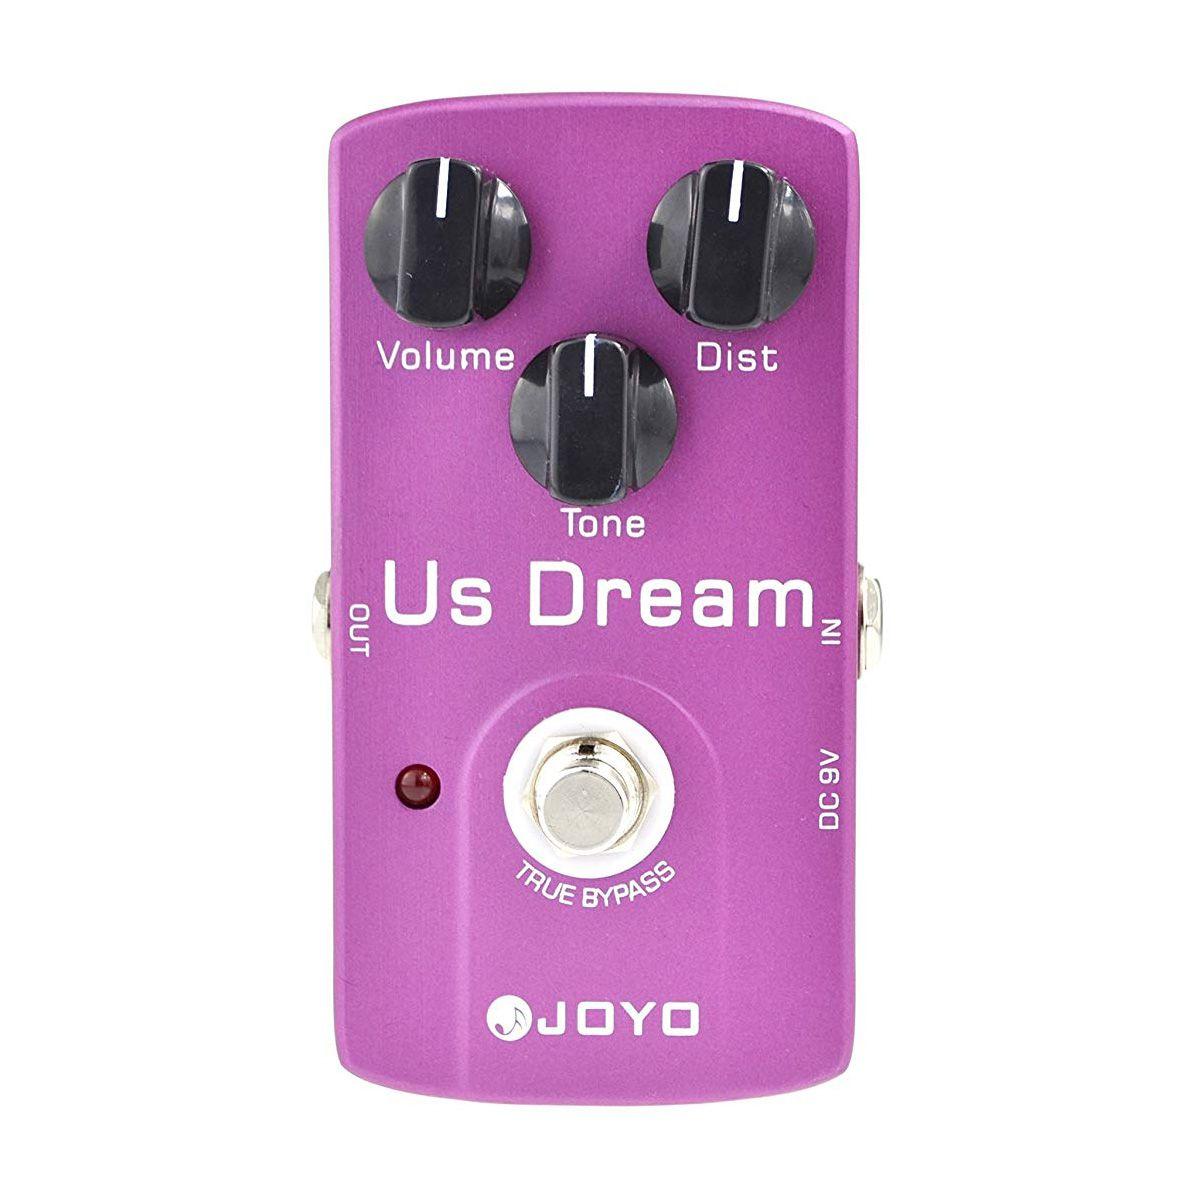 Pedal de Efeito Joyo Jf-34 Us Dream Overdrive/Distortion